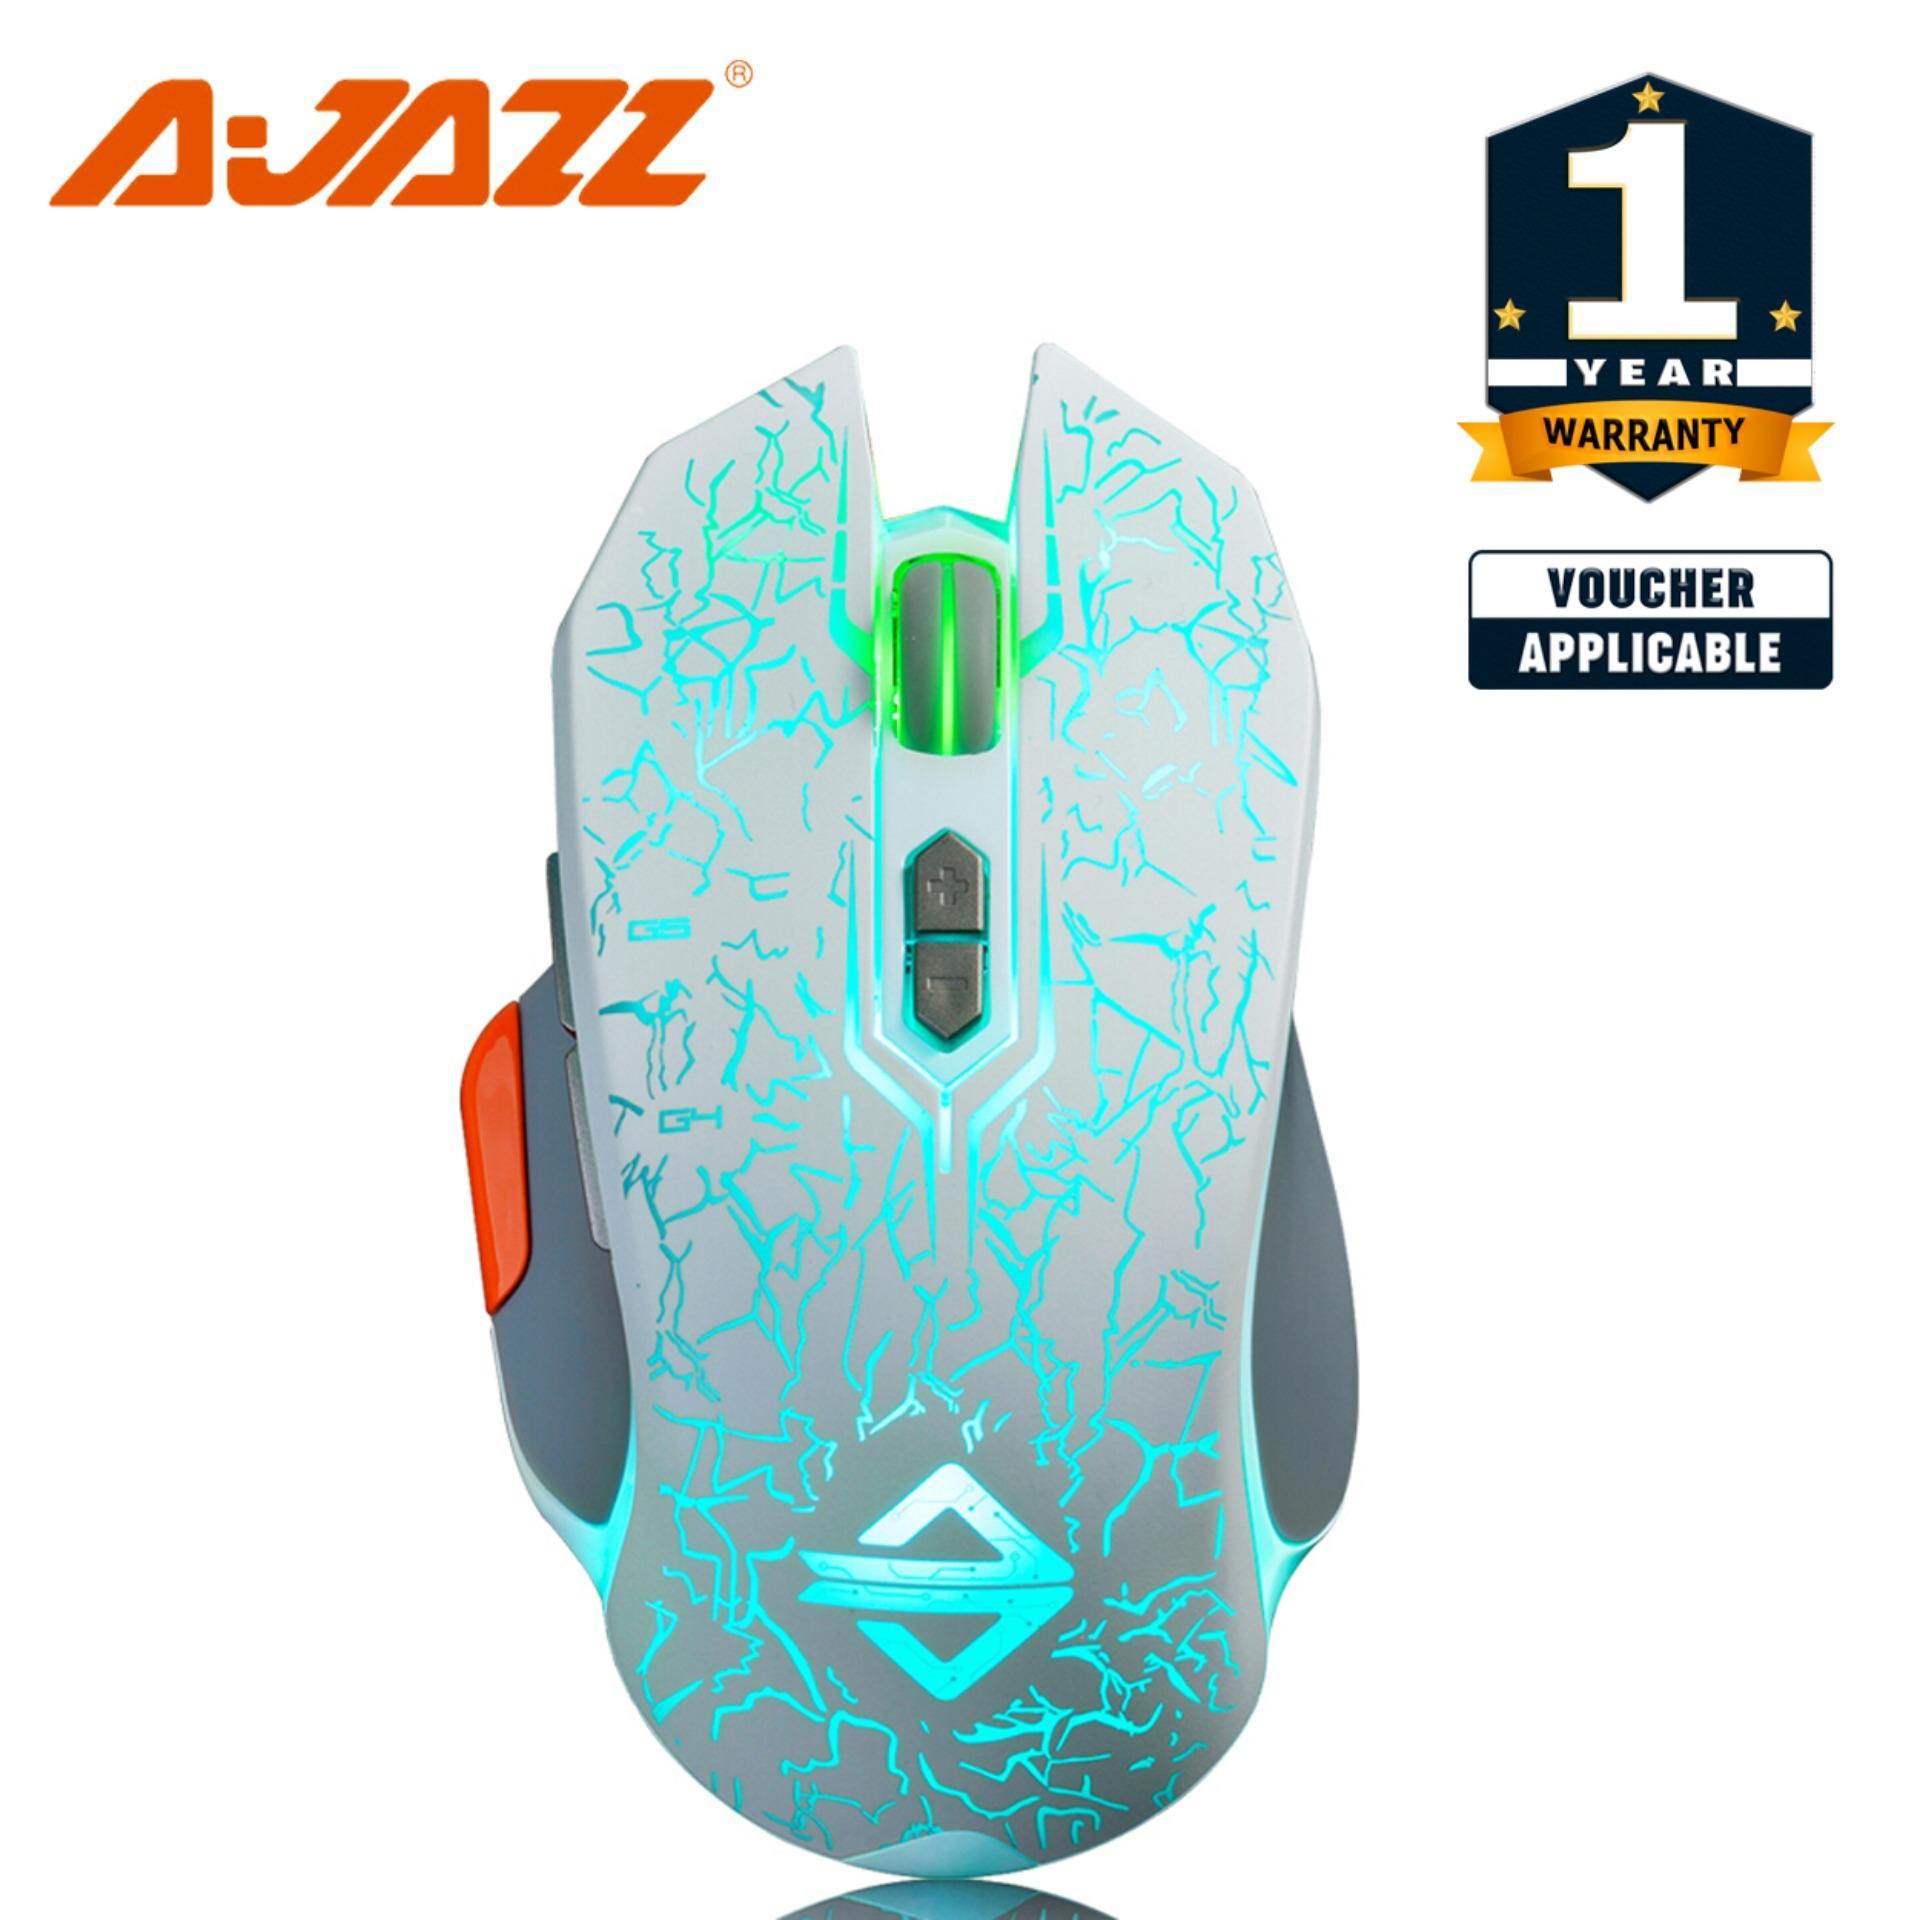 AJAZZ Philippines: AJAZZ price list - Mechanical & Gaming Keyboard ...